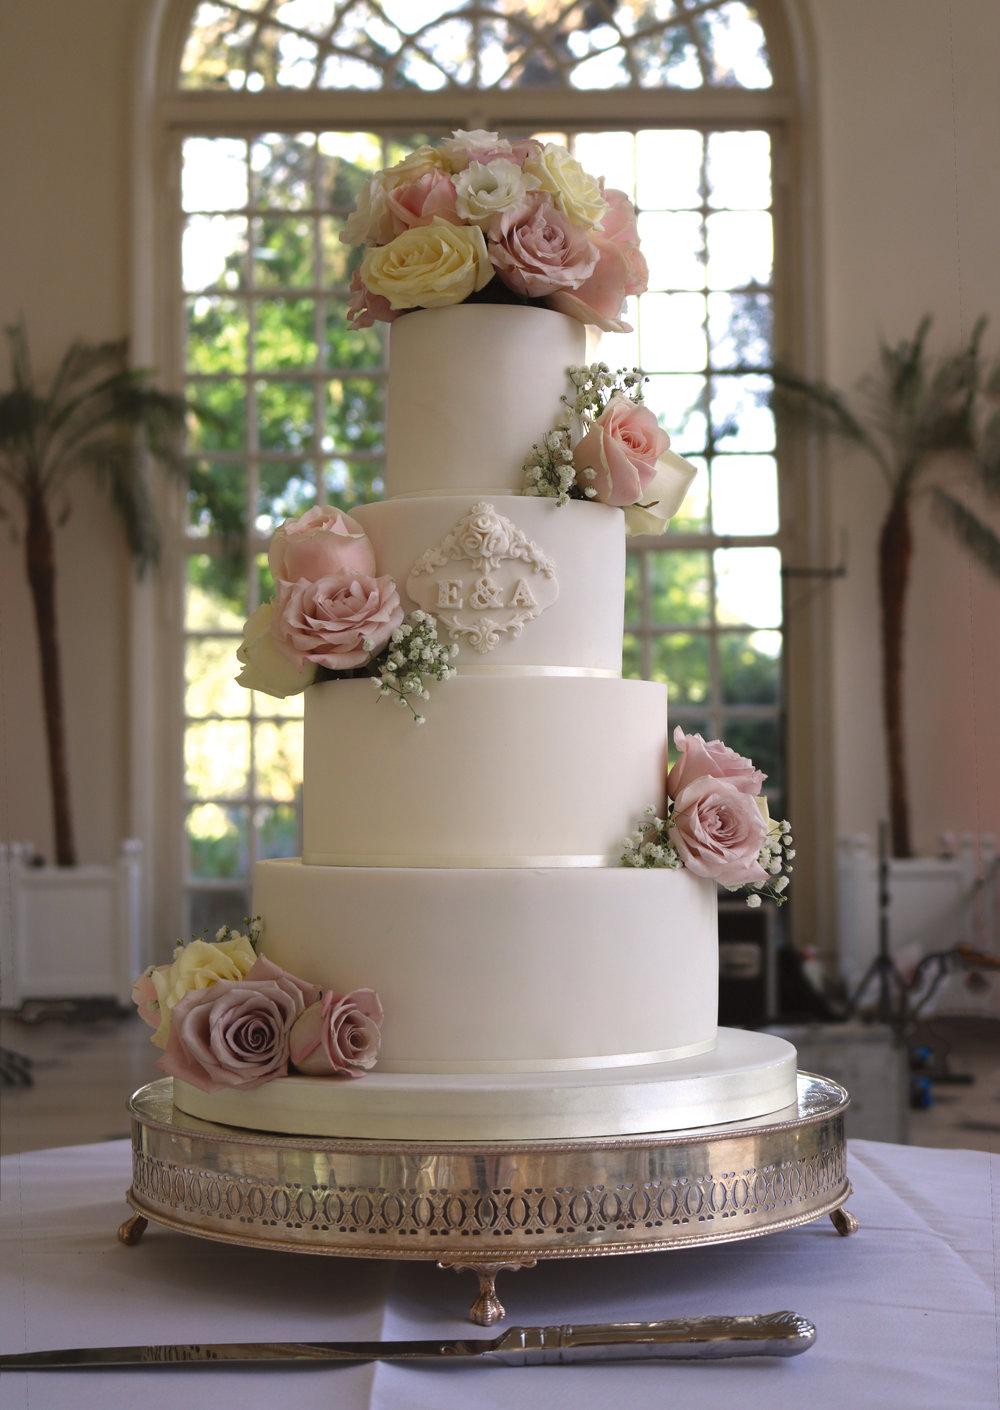 Elegant monogrammed wedding cake at Kew Gardens Orangery in West London